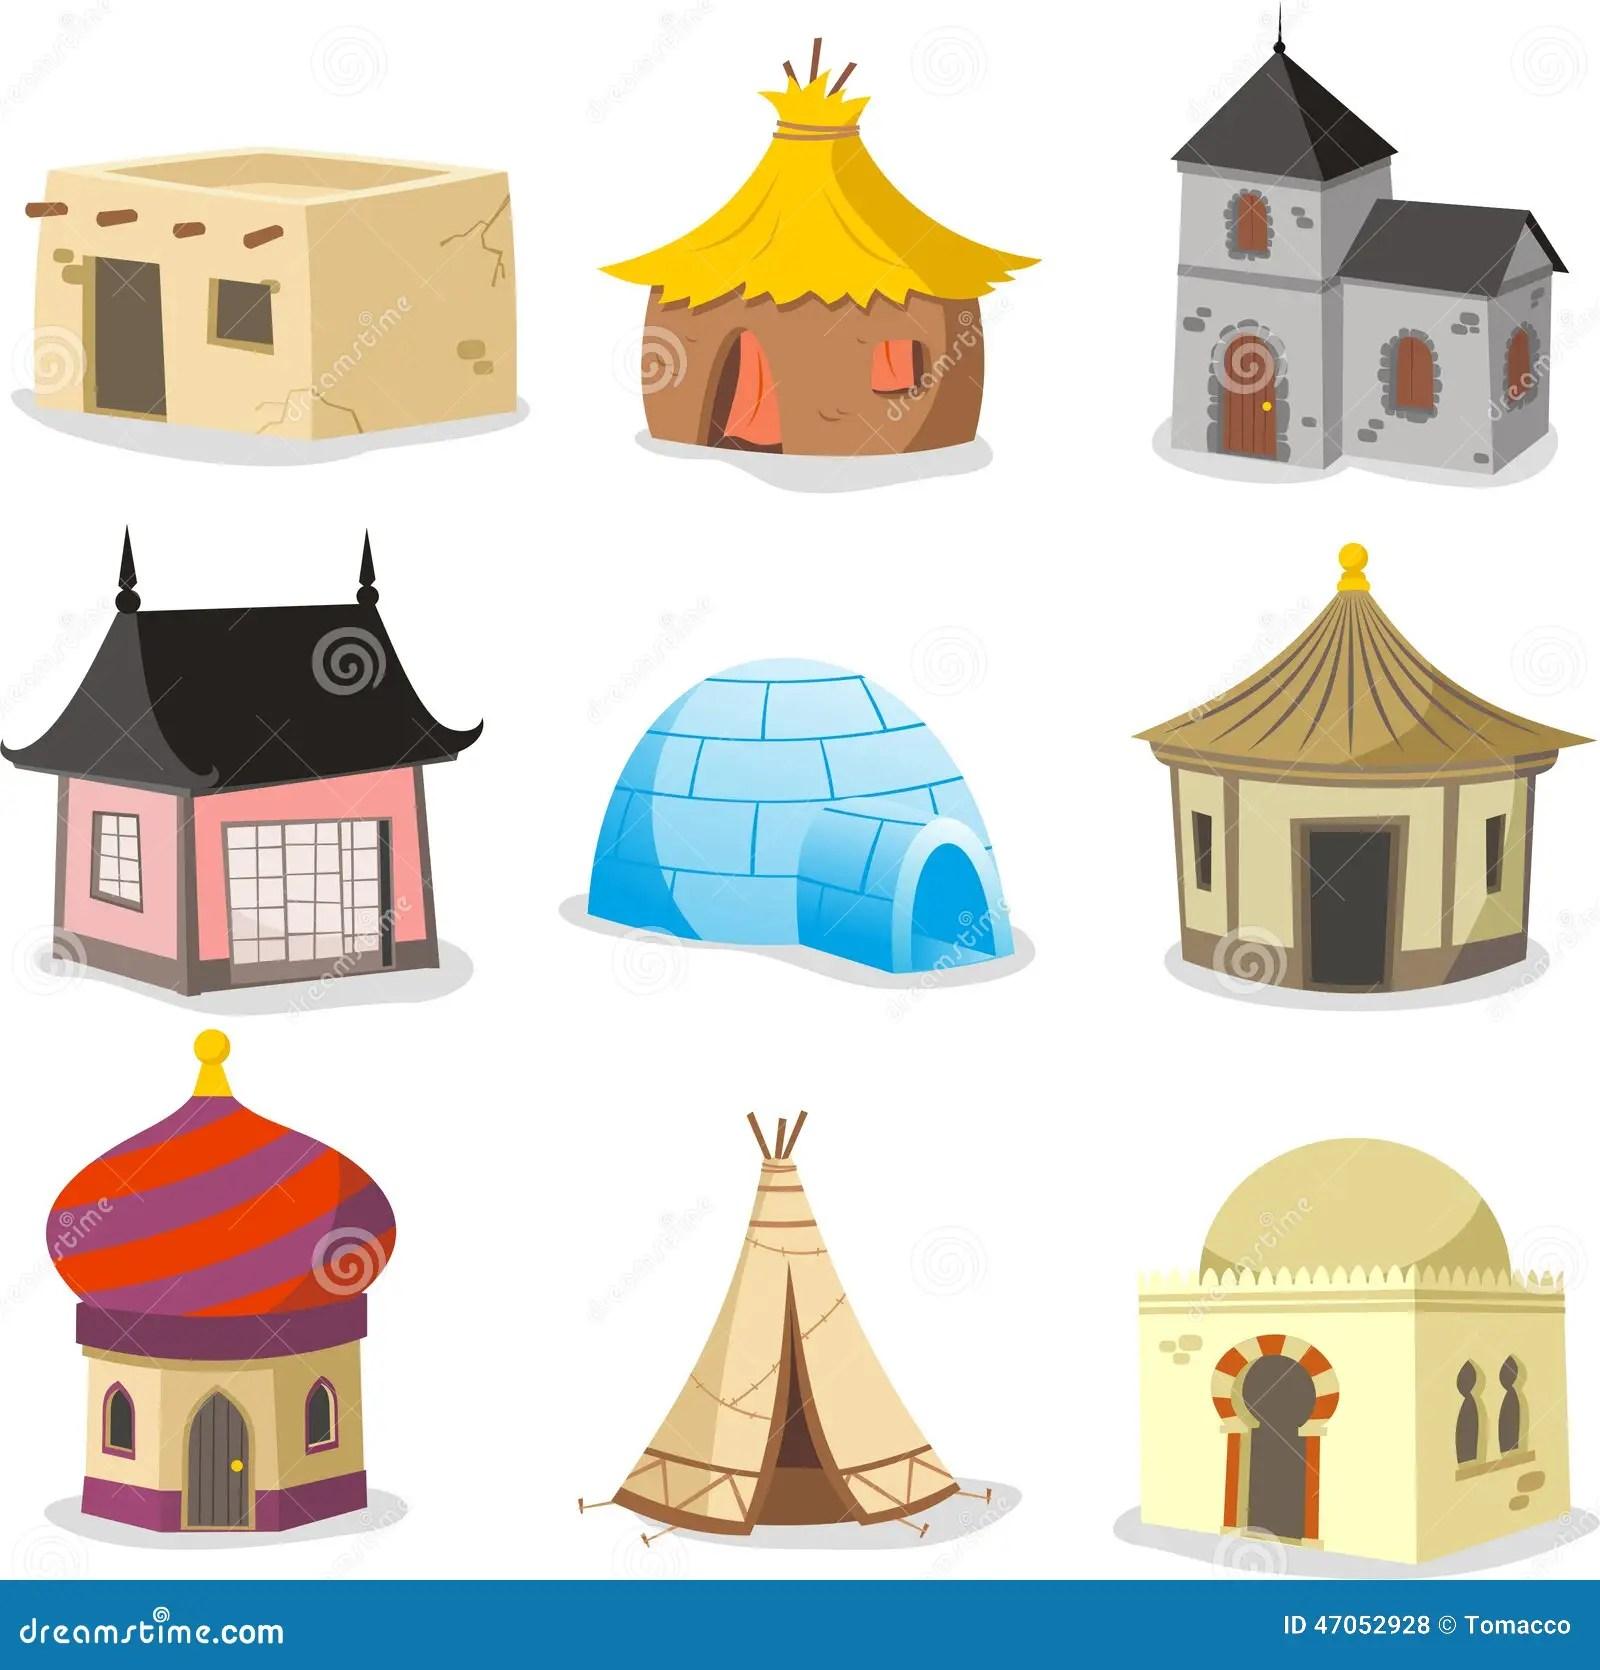 Traditional Houses House Igloo Hut Shack Slum Cabinet